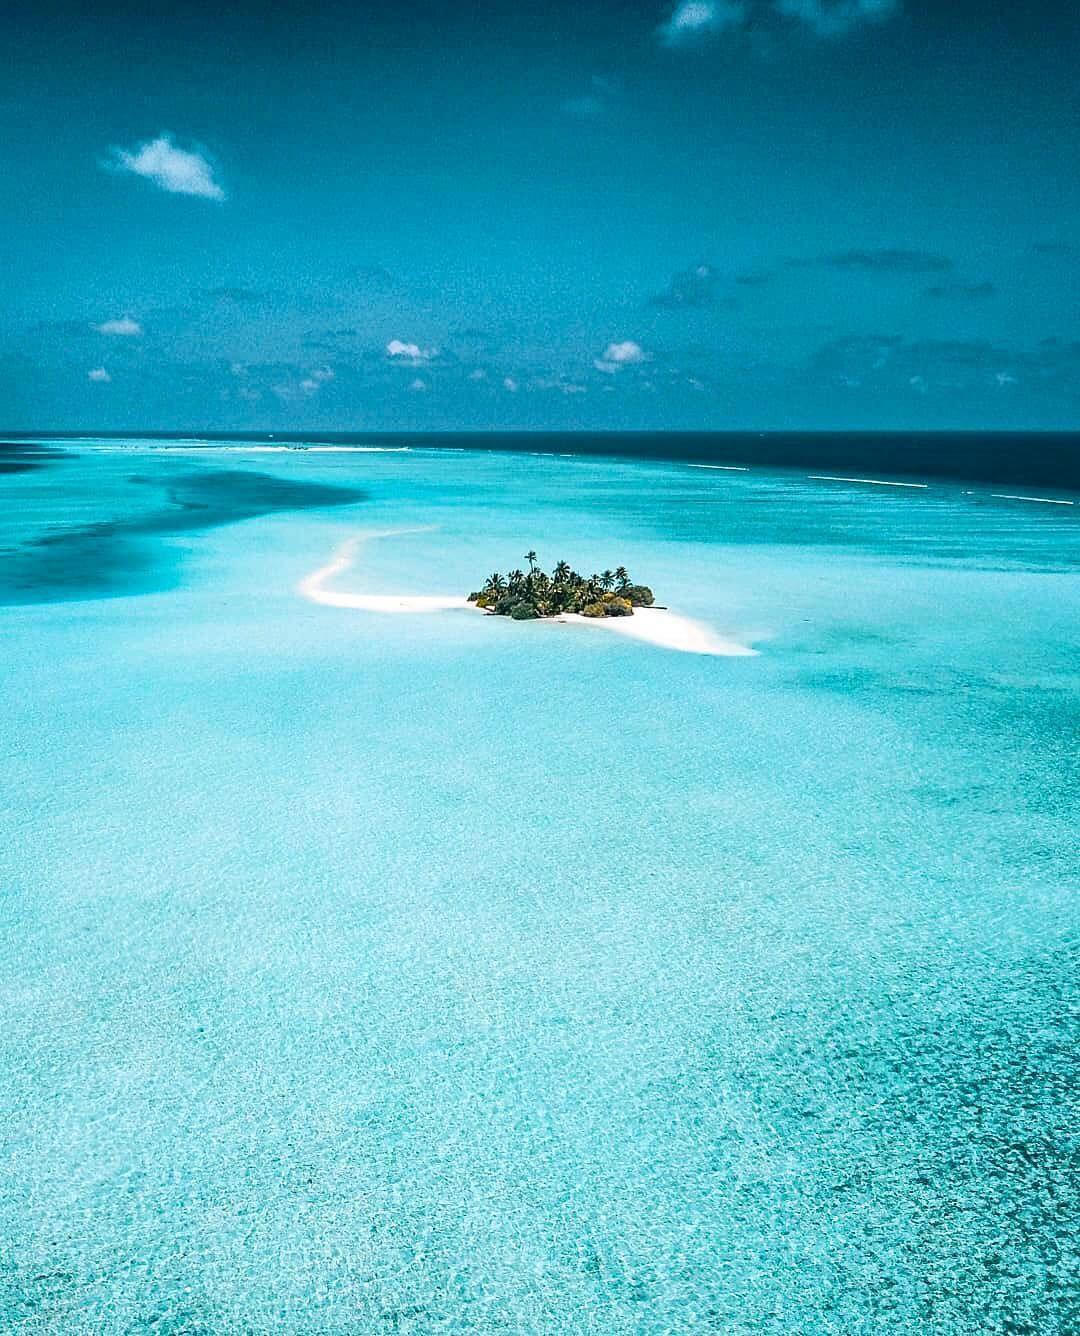 The Maldives Islands #Maldives Photo @toma_paul #beach